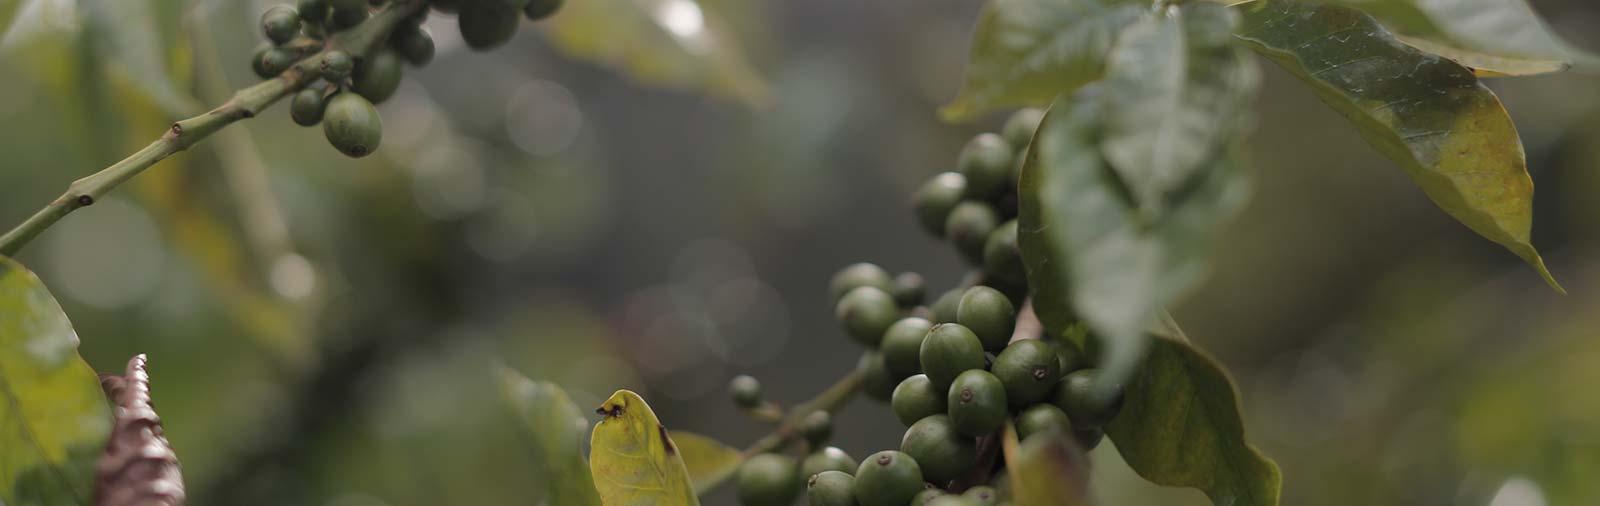 Macadamia - Macadamia ternifolia FvMUELL